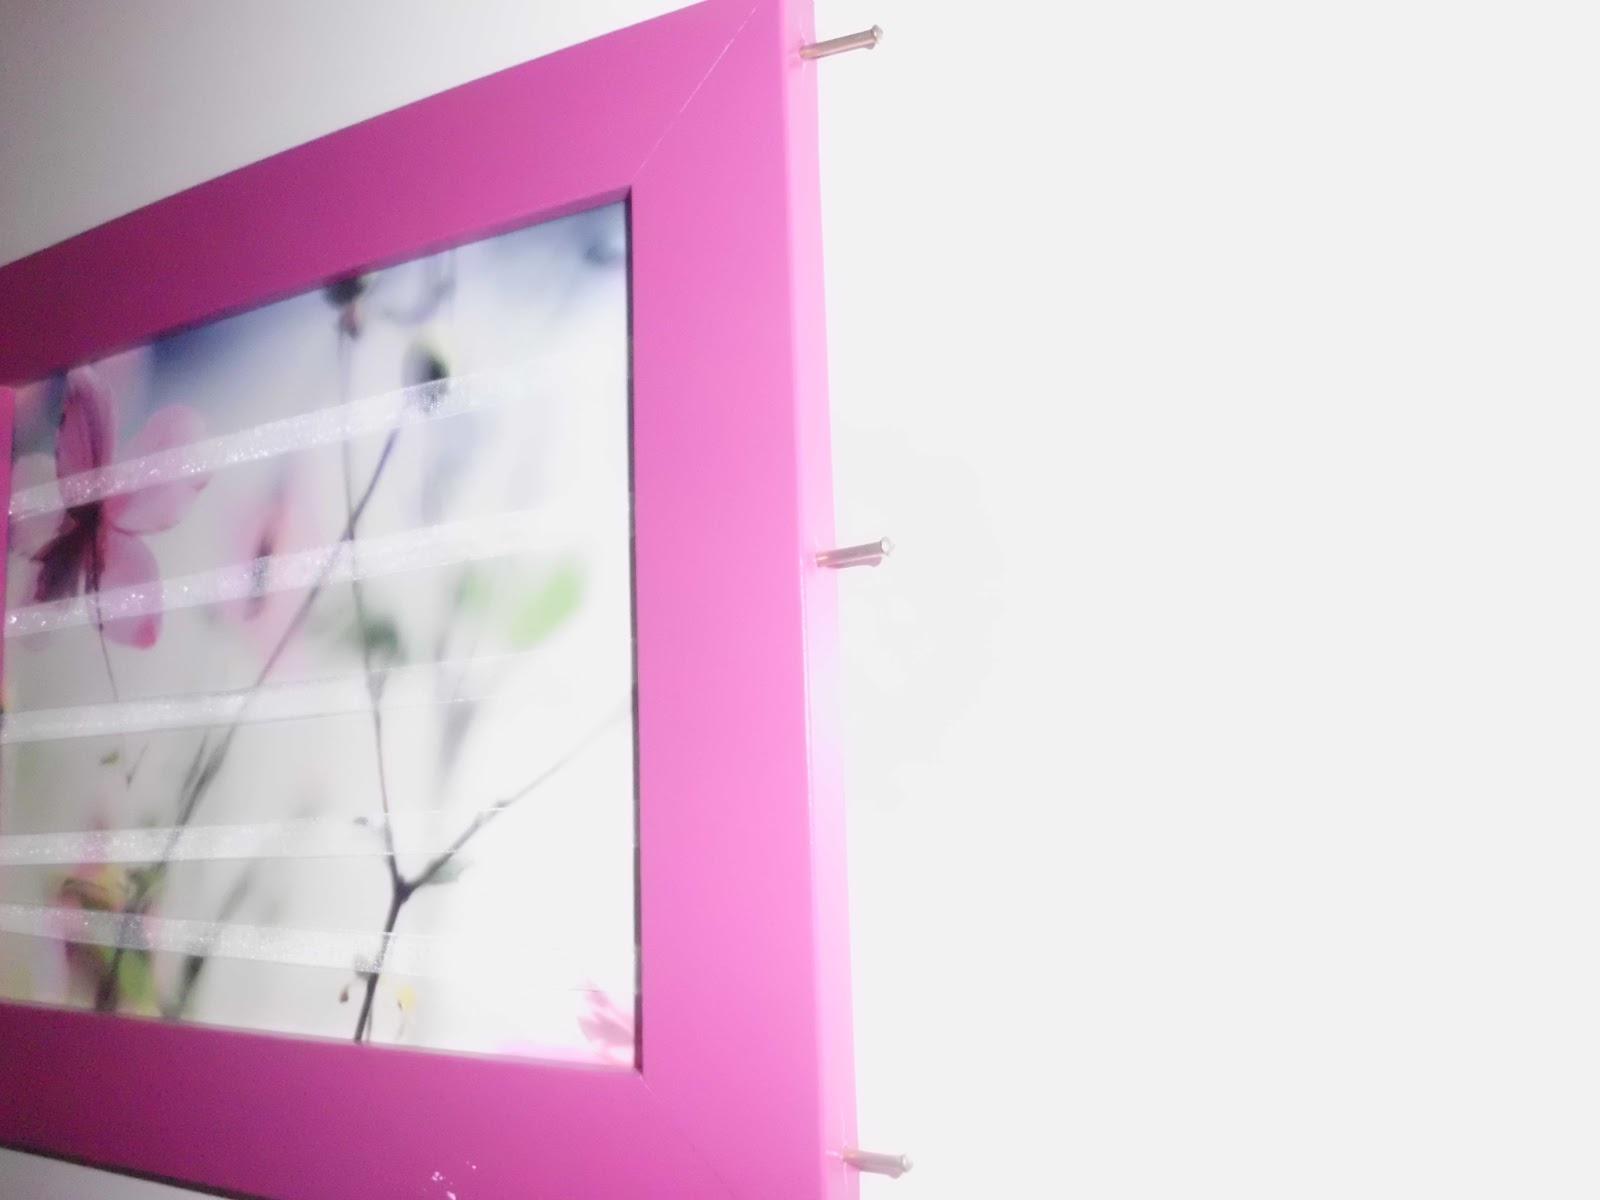 kristallzauber diy ohrring bilderrahmen selbermachen. Black Bedroom Furniture Sets. Home Design Ideas